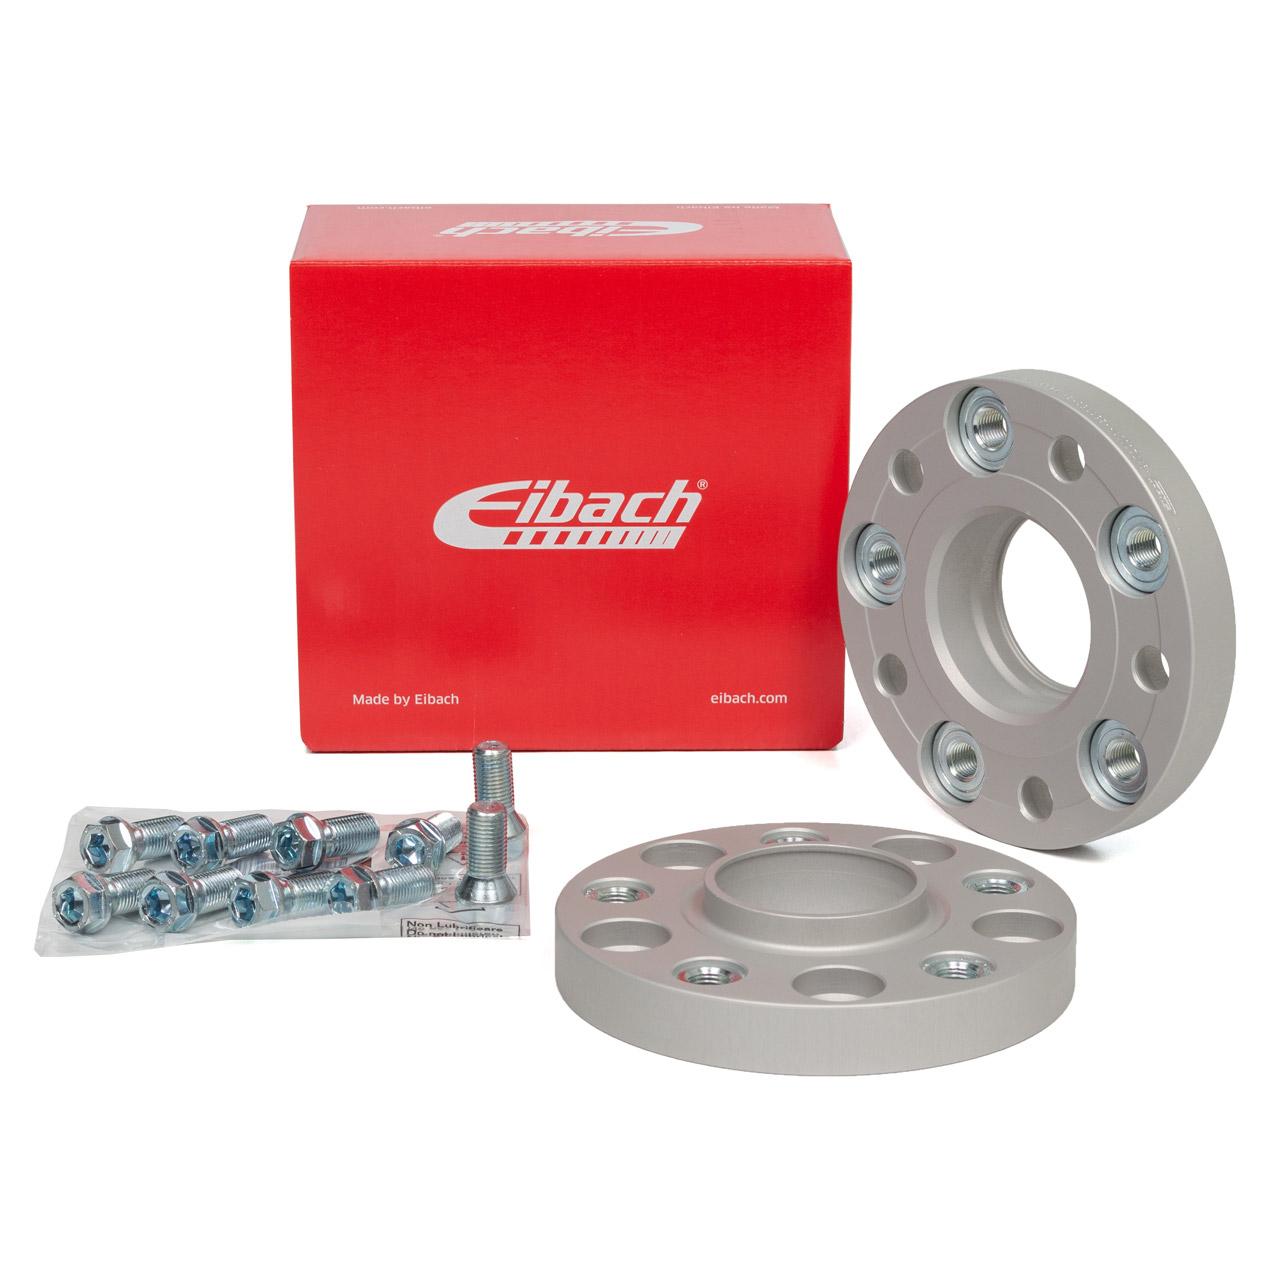 EIBACH PRO SPACER 46mm Spurverbreiterung PORSCHE 996 997 991 Boxster Cayman 986 987